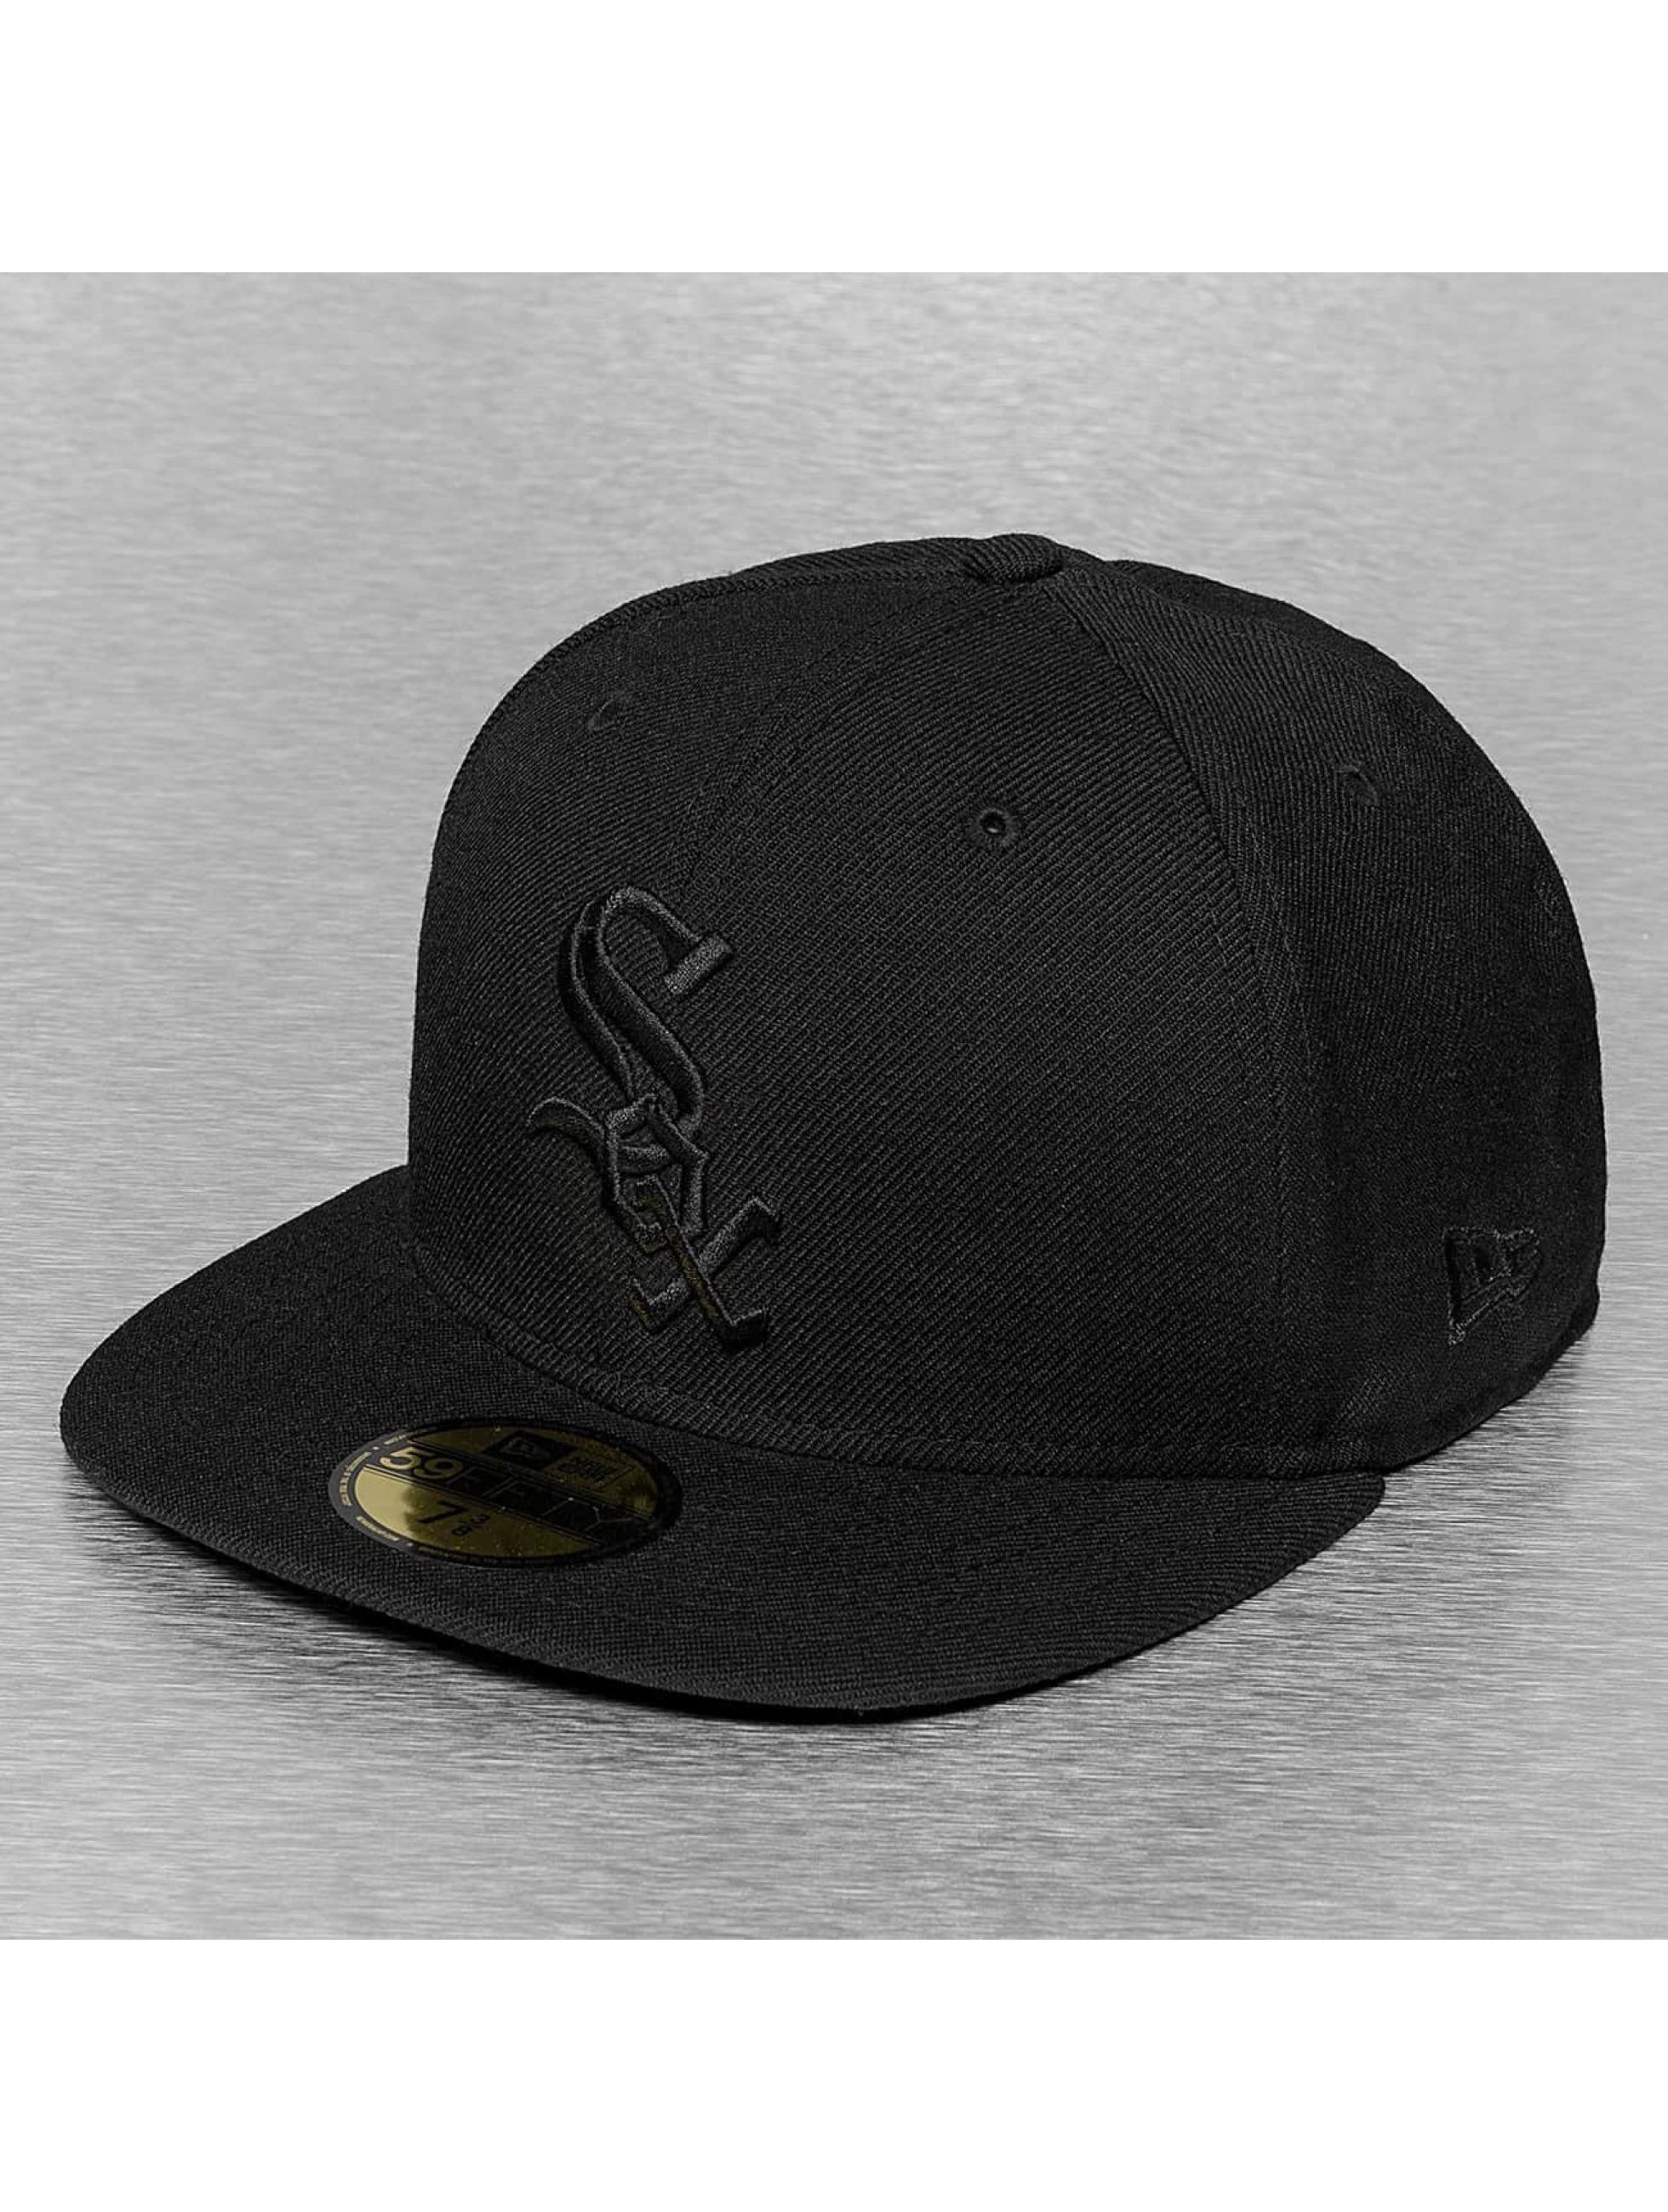 New Era Casquette Fitted Black On Black Chicago White Sox noir